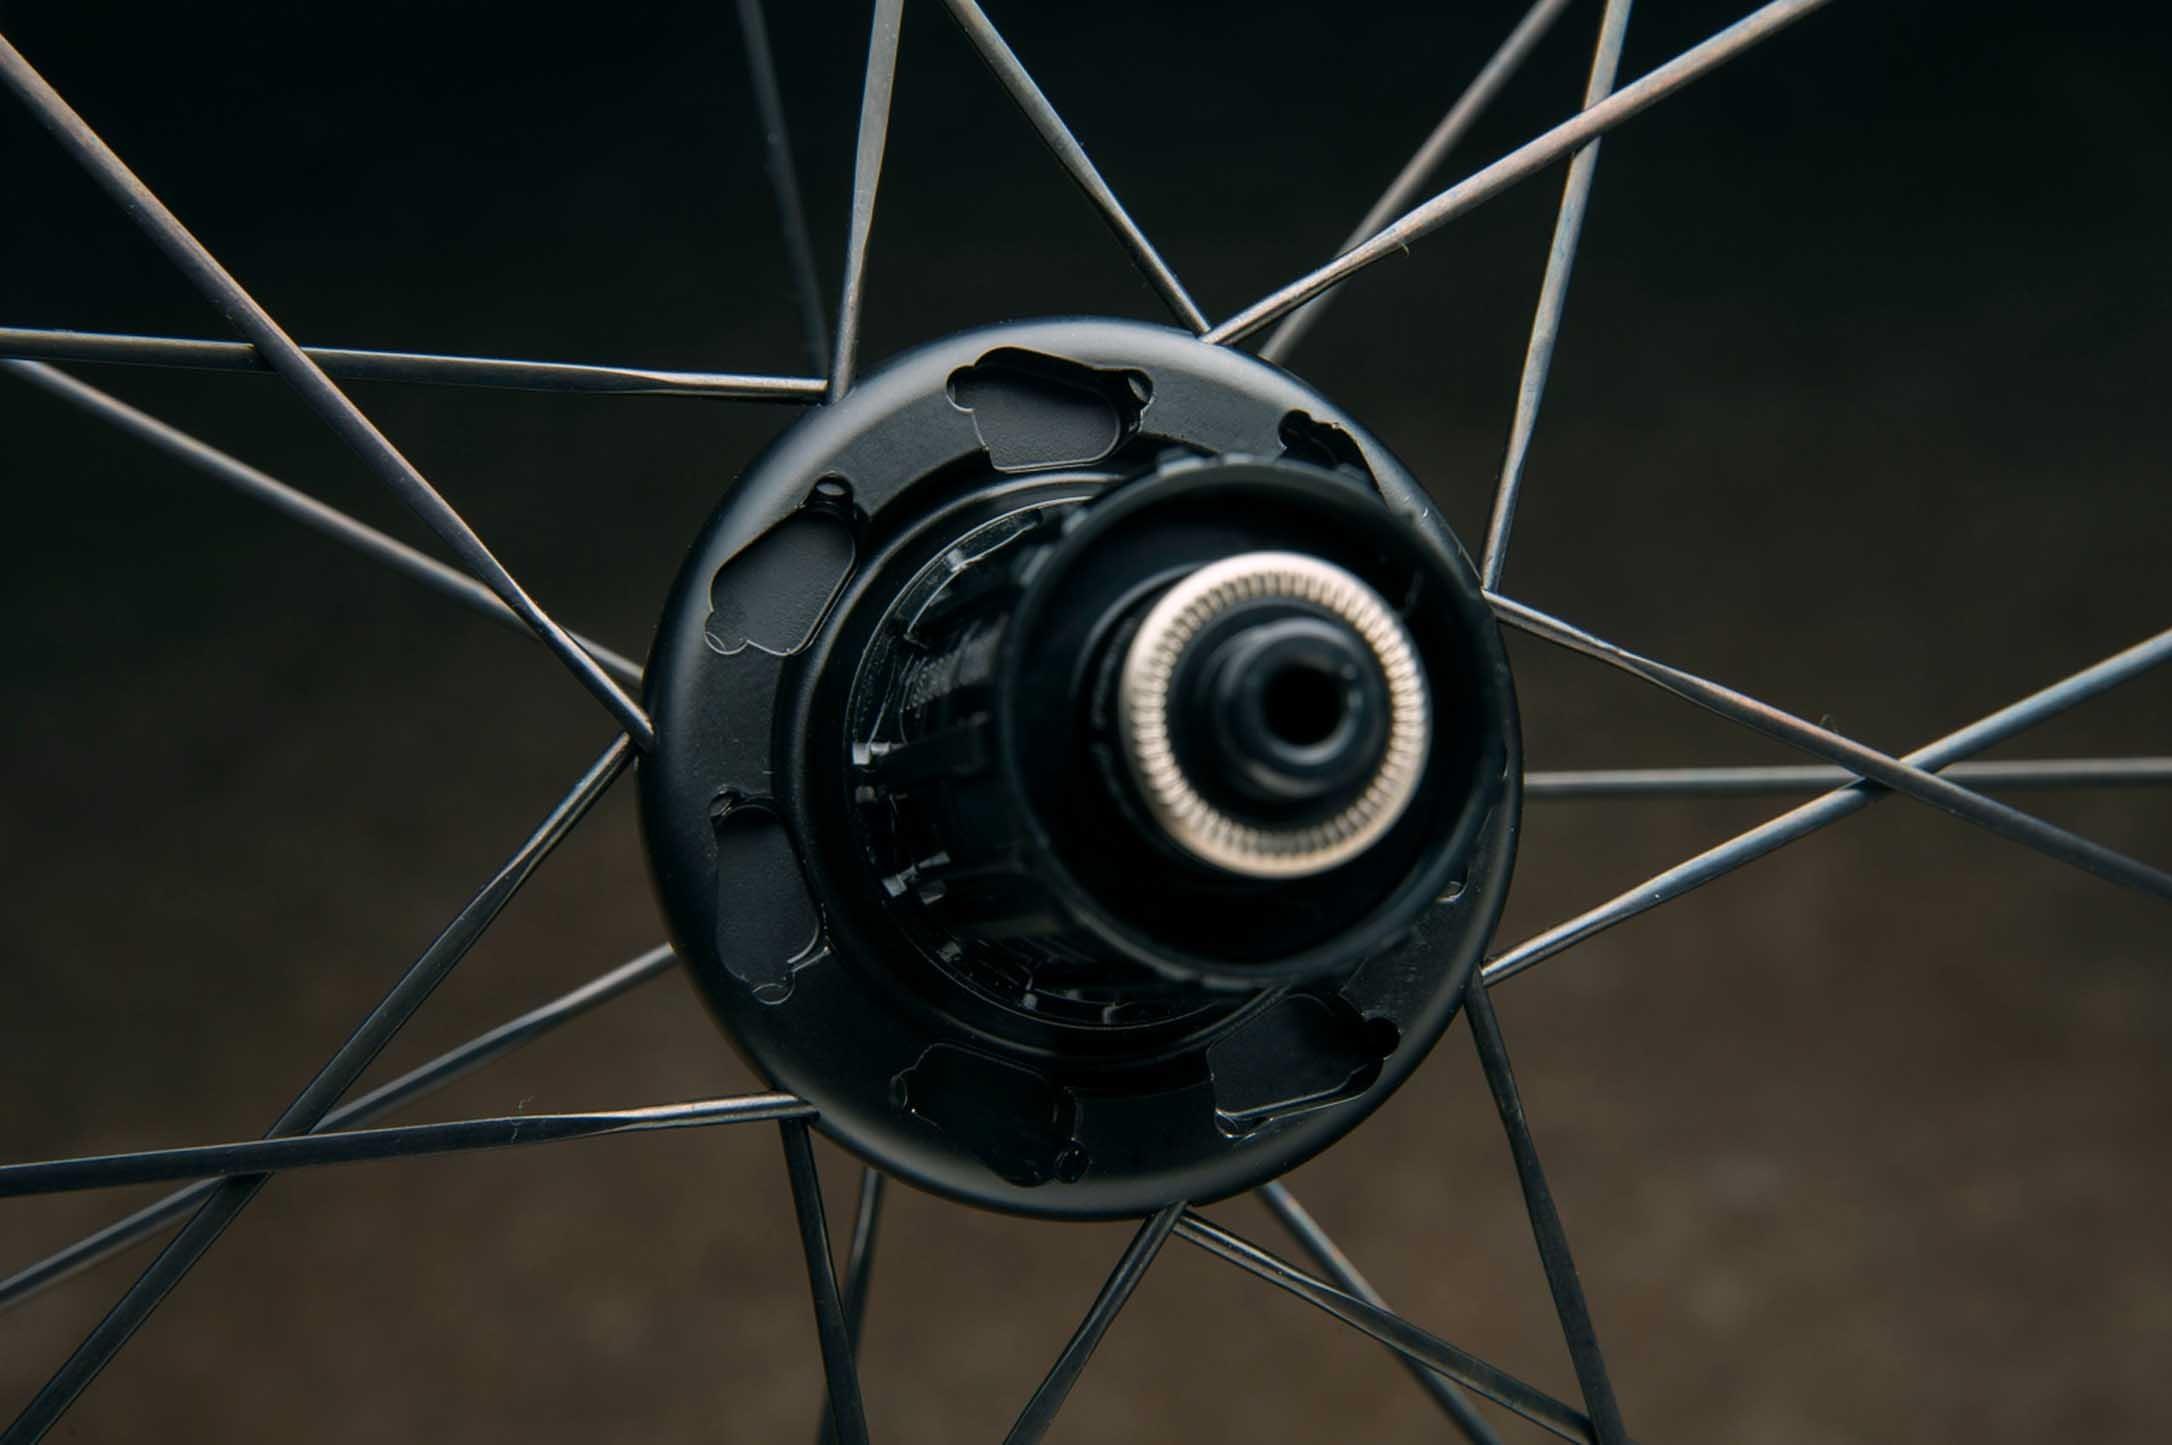 Giant 2016 TCR Advanced SL Wheels